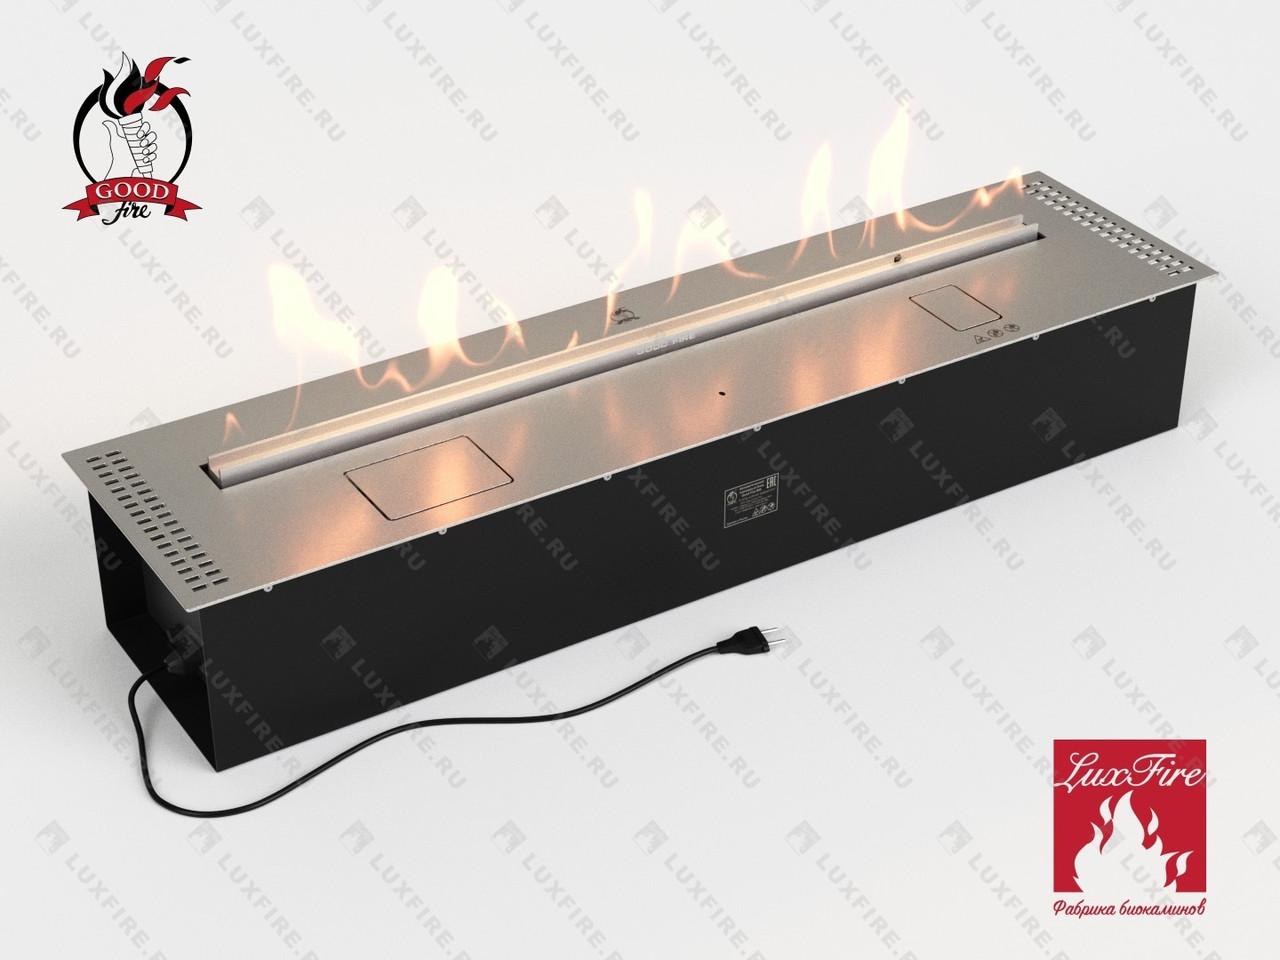 Автоматический биокамин Good Fire 1100 INOX